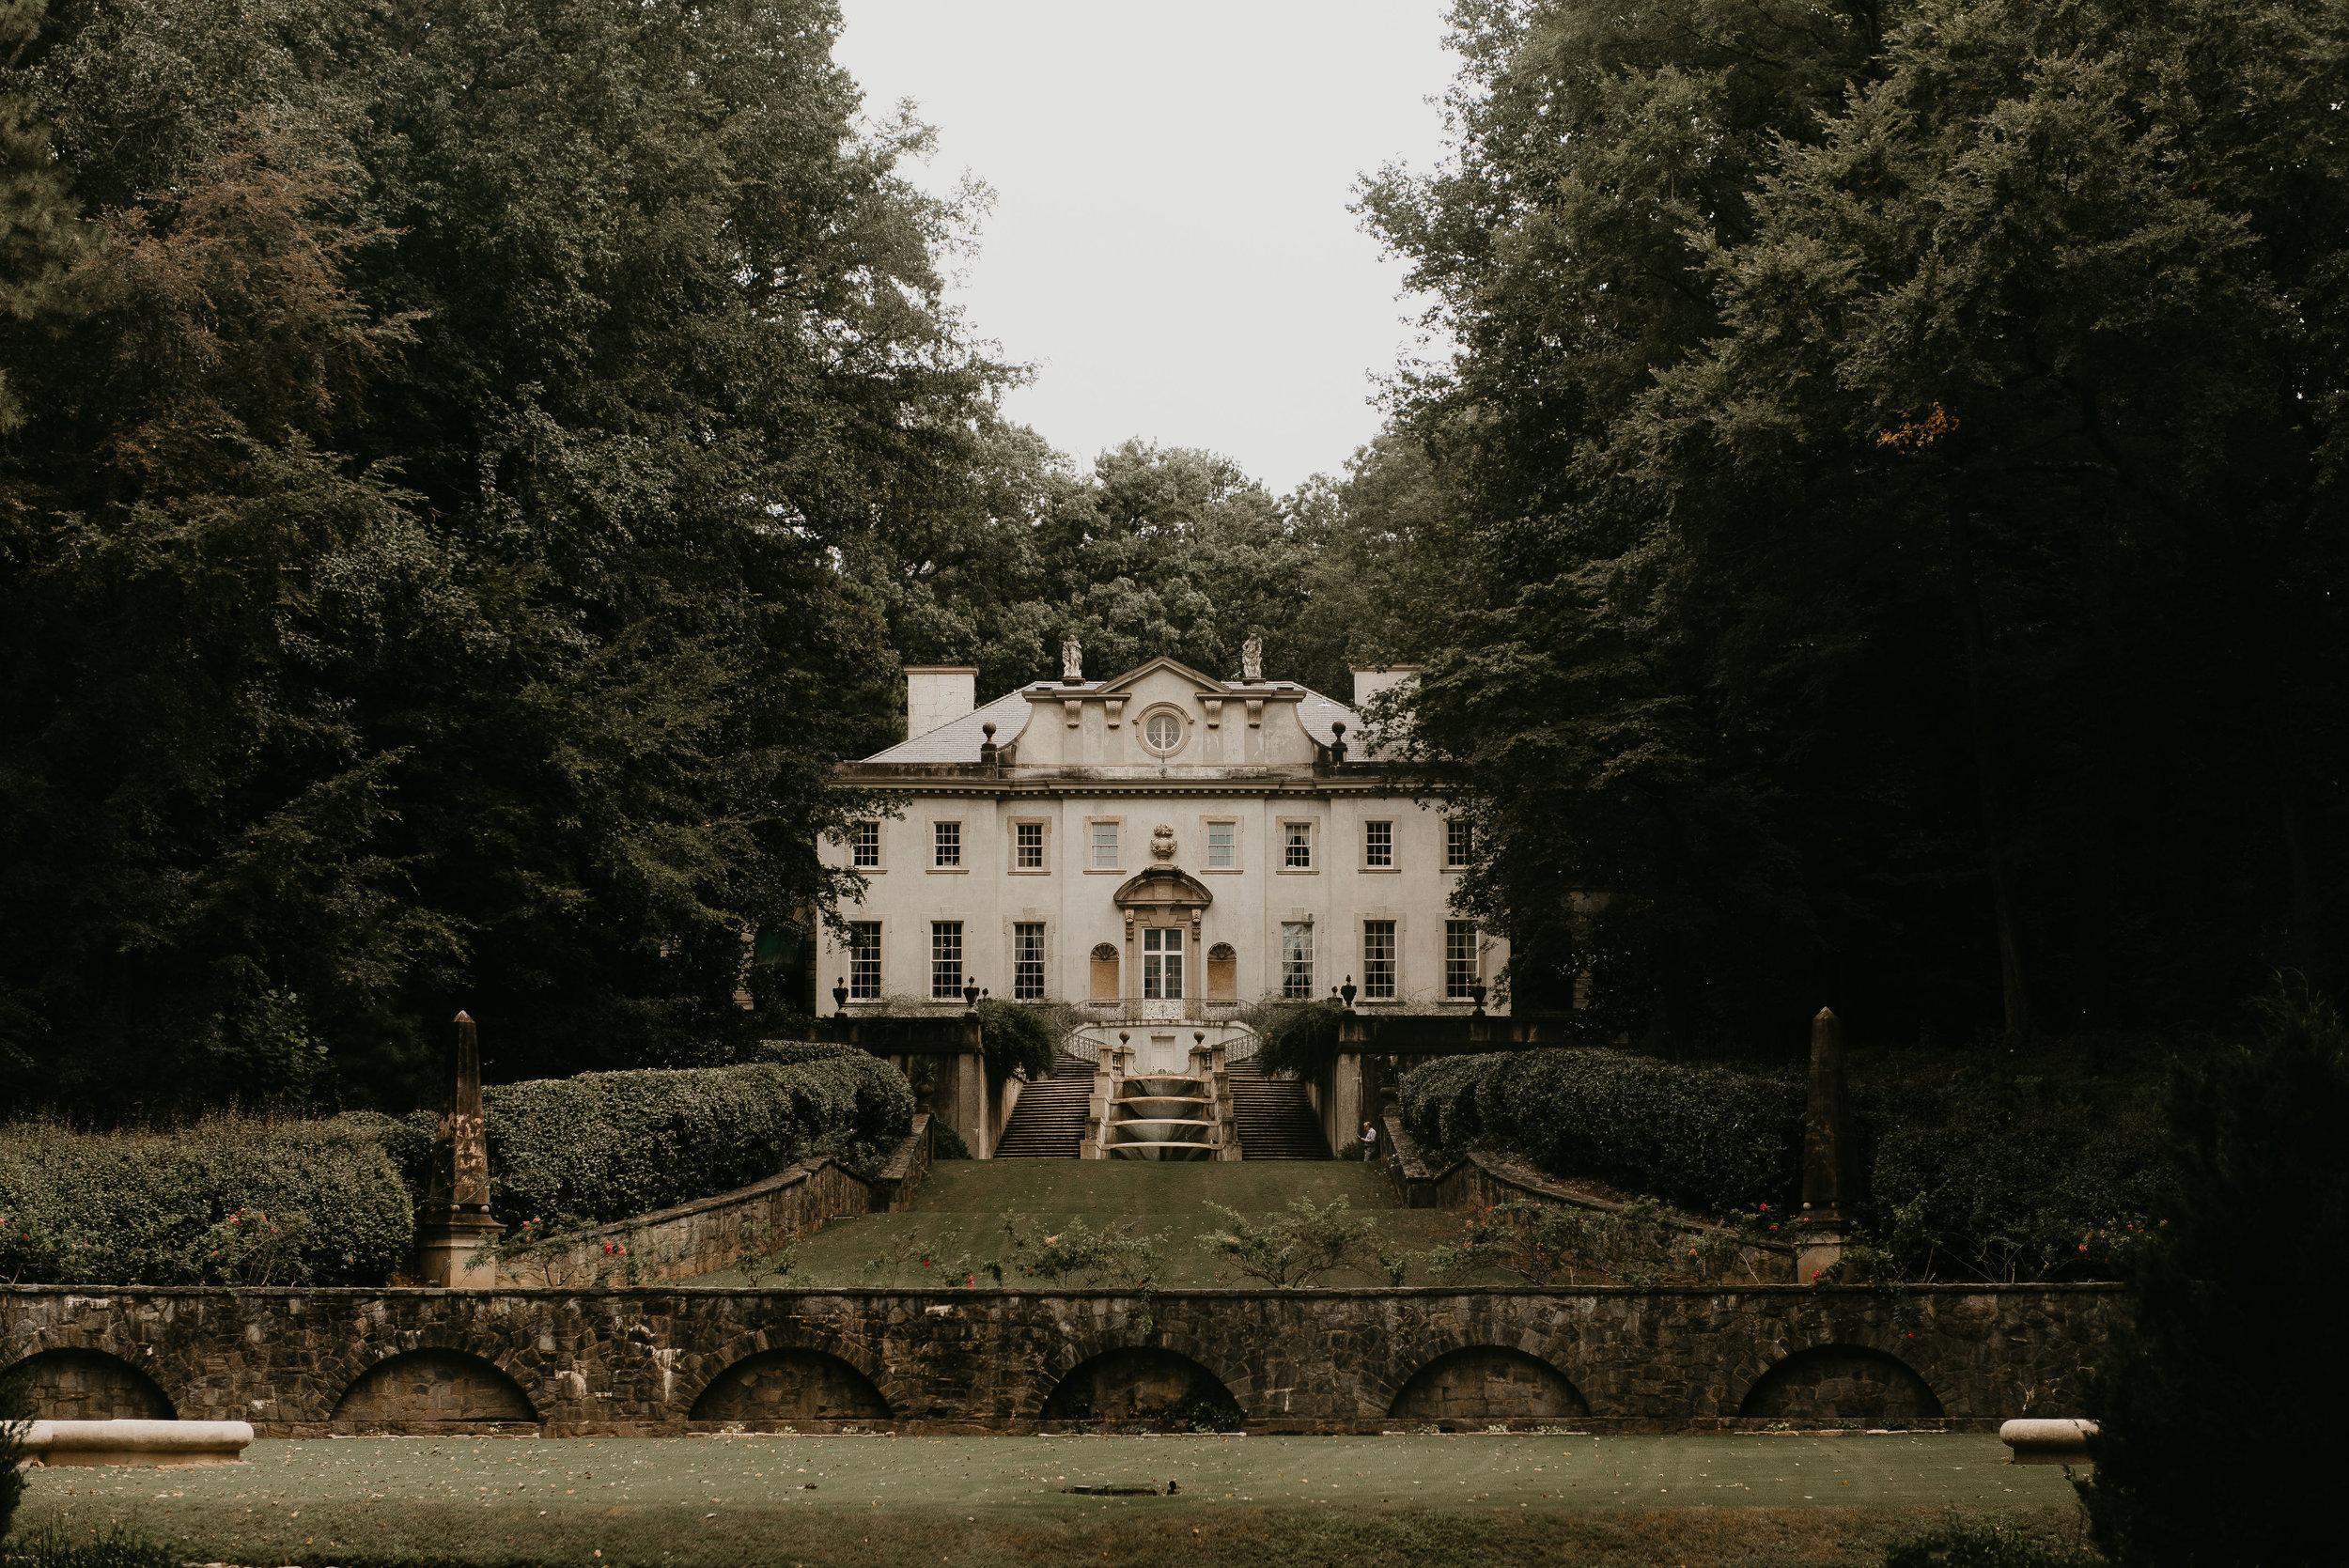 The Historic Swan House and lawn in Atlanta, GA